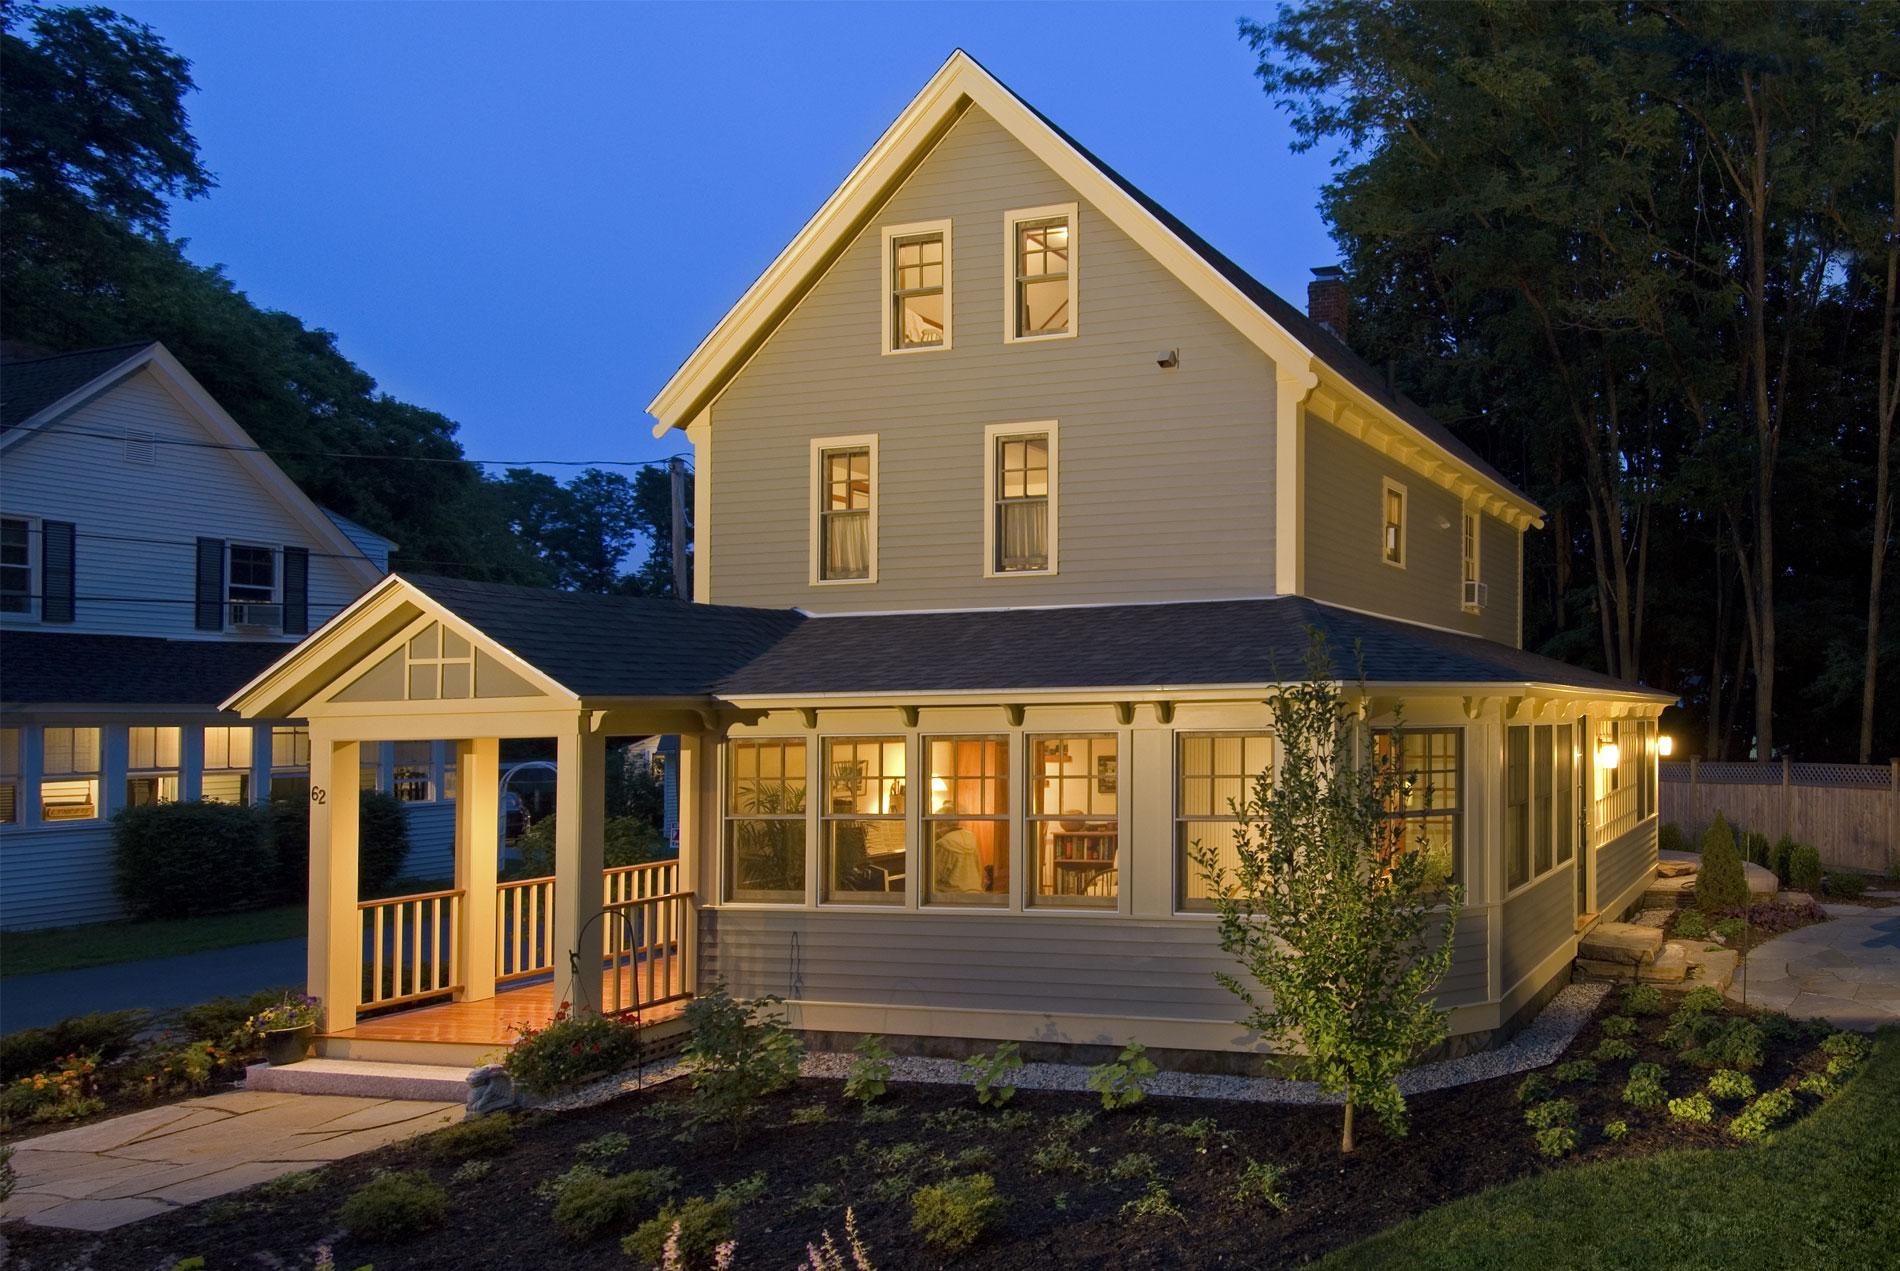 Cottage Revival